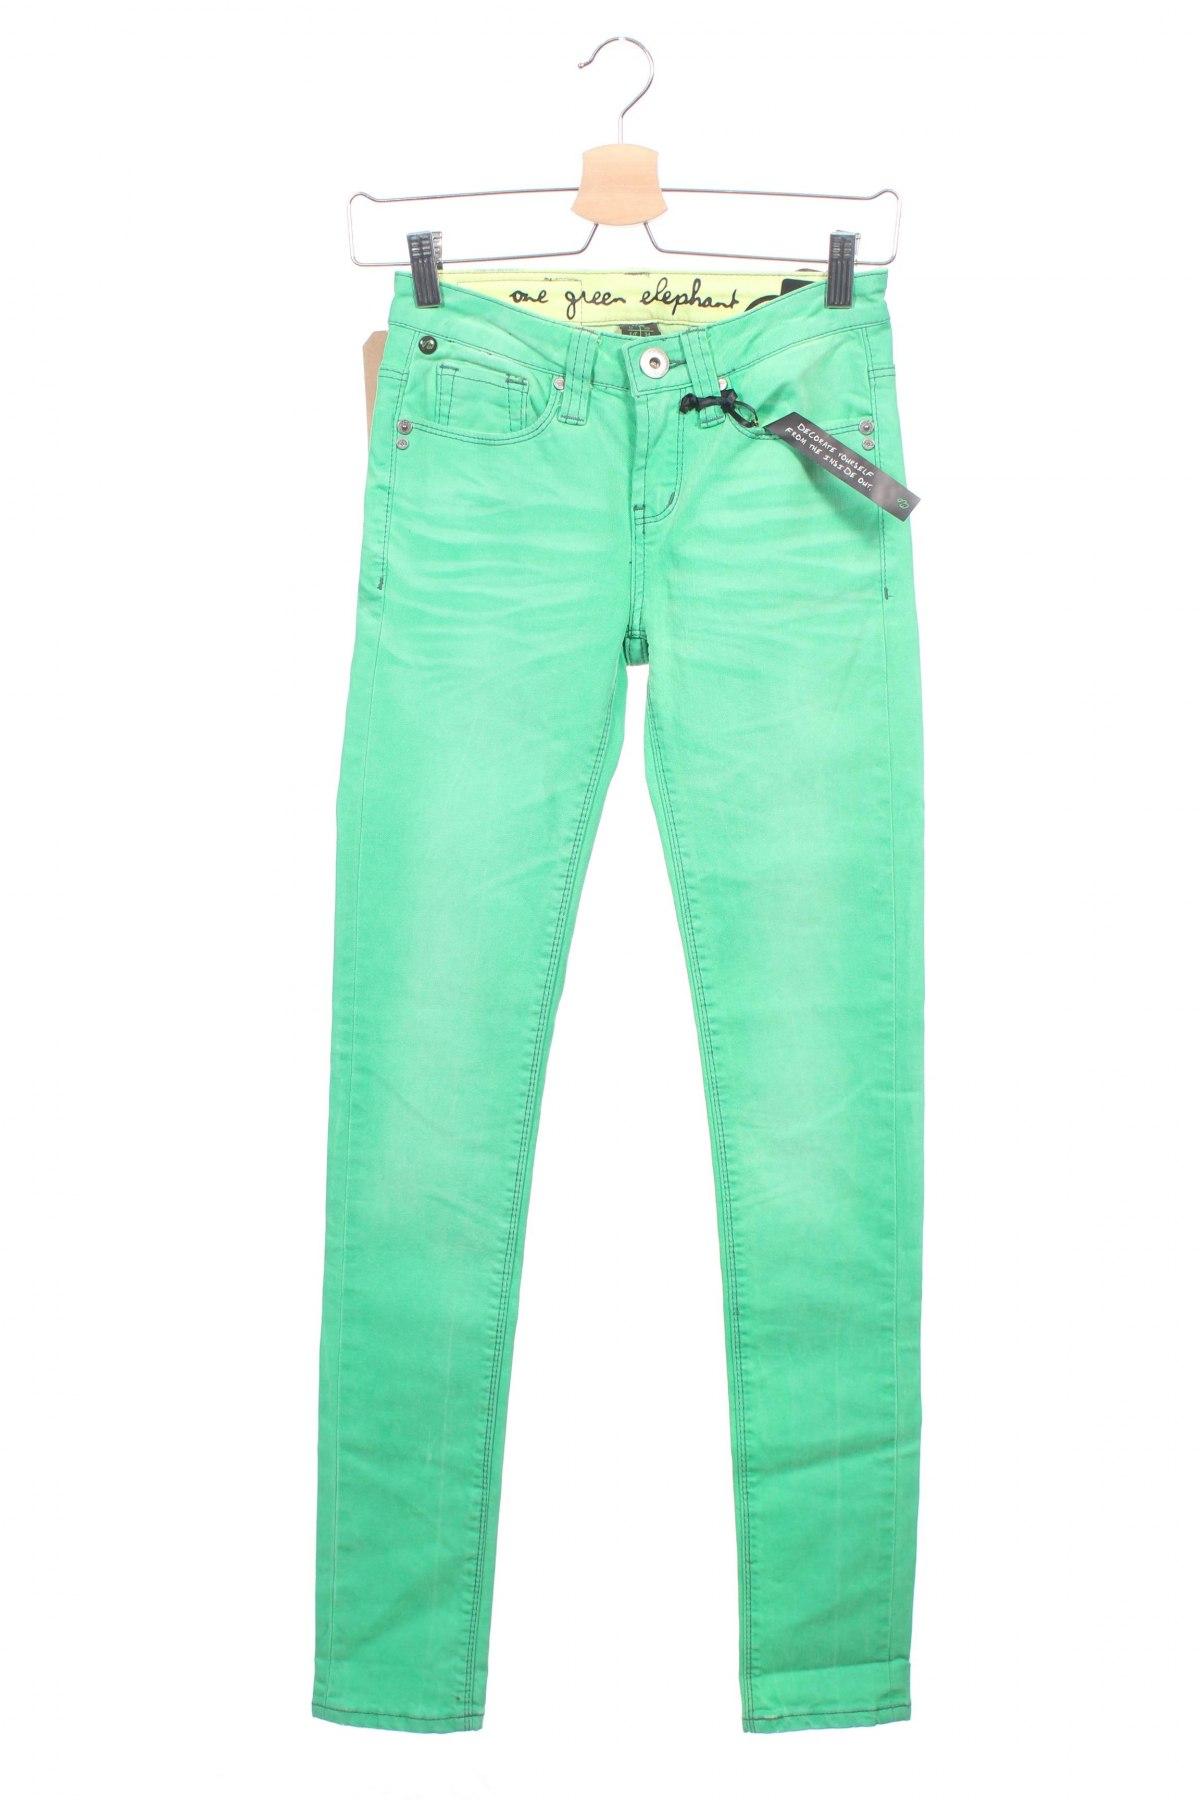 ##### OGE One Green Elephant Kosai Damenjeans Second Skin Hellgrün Neu #####